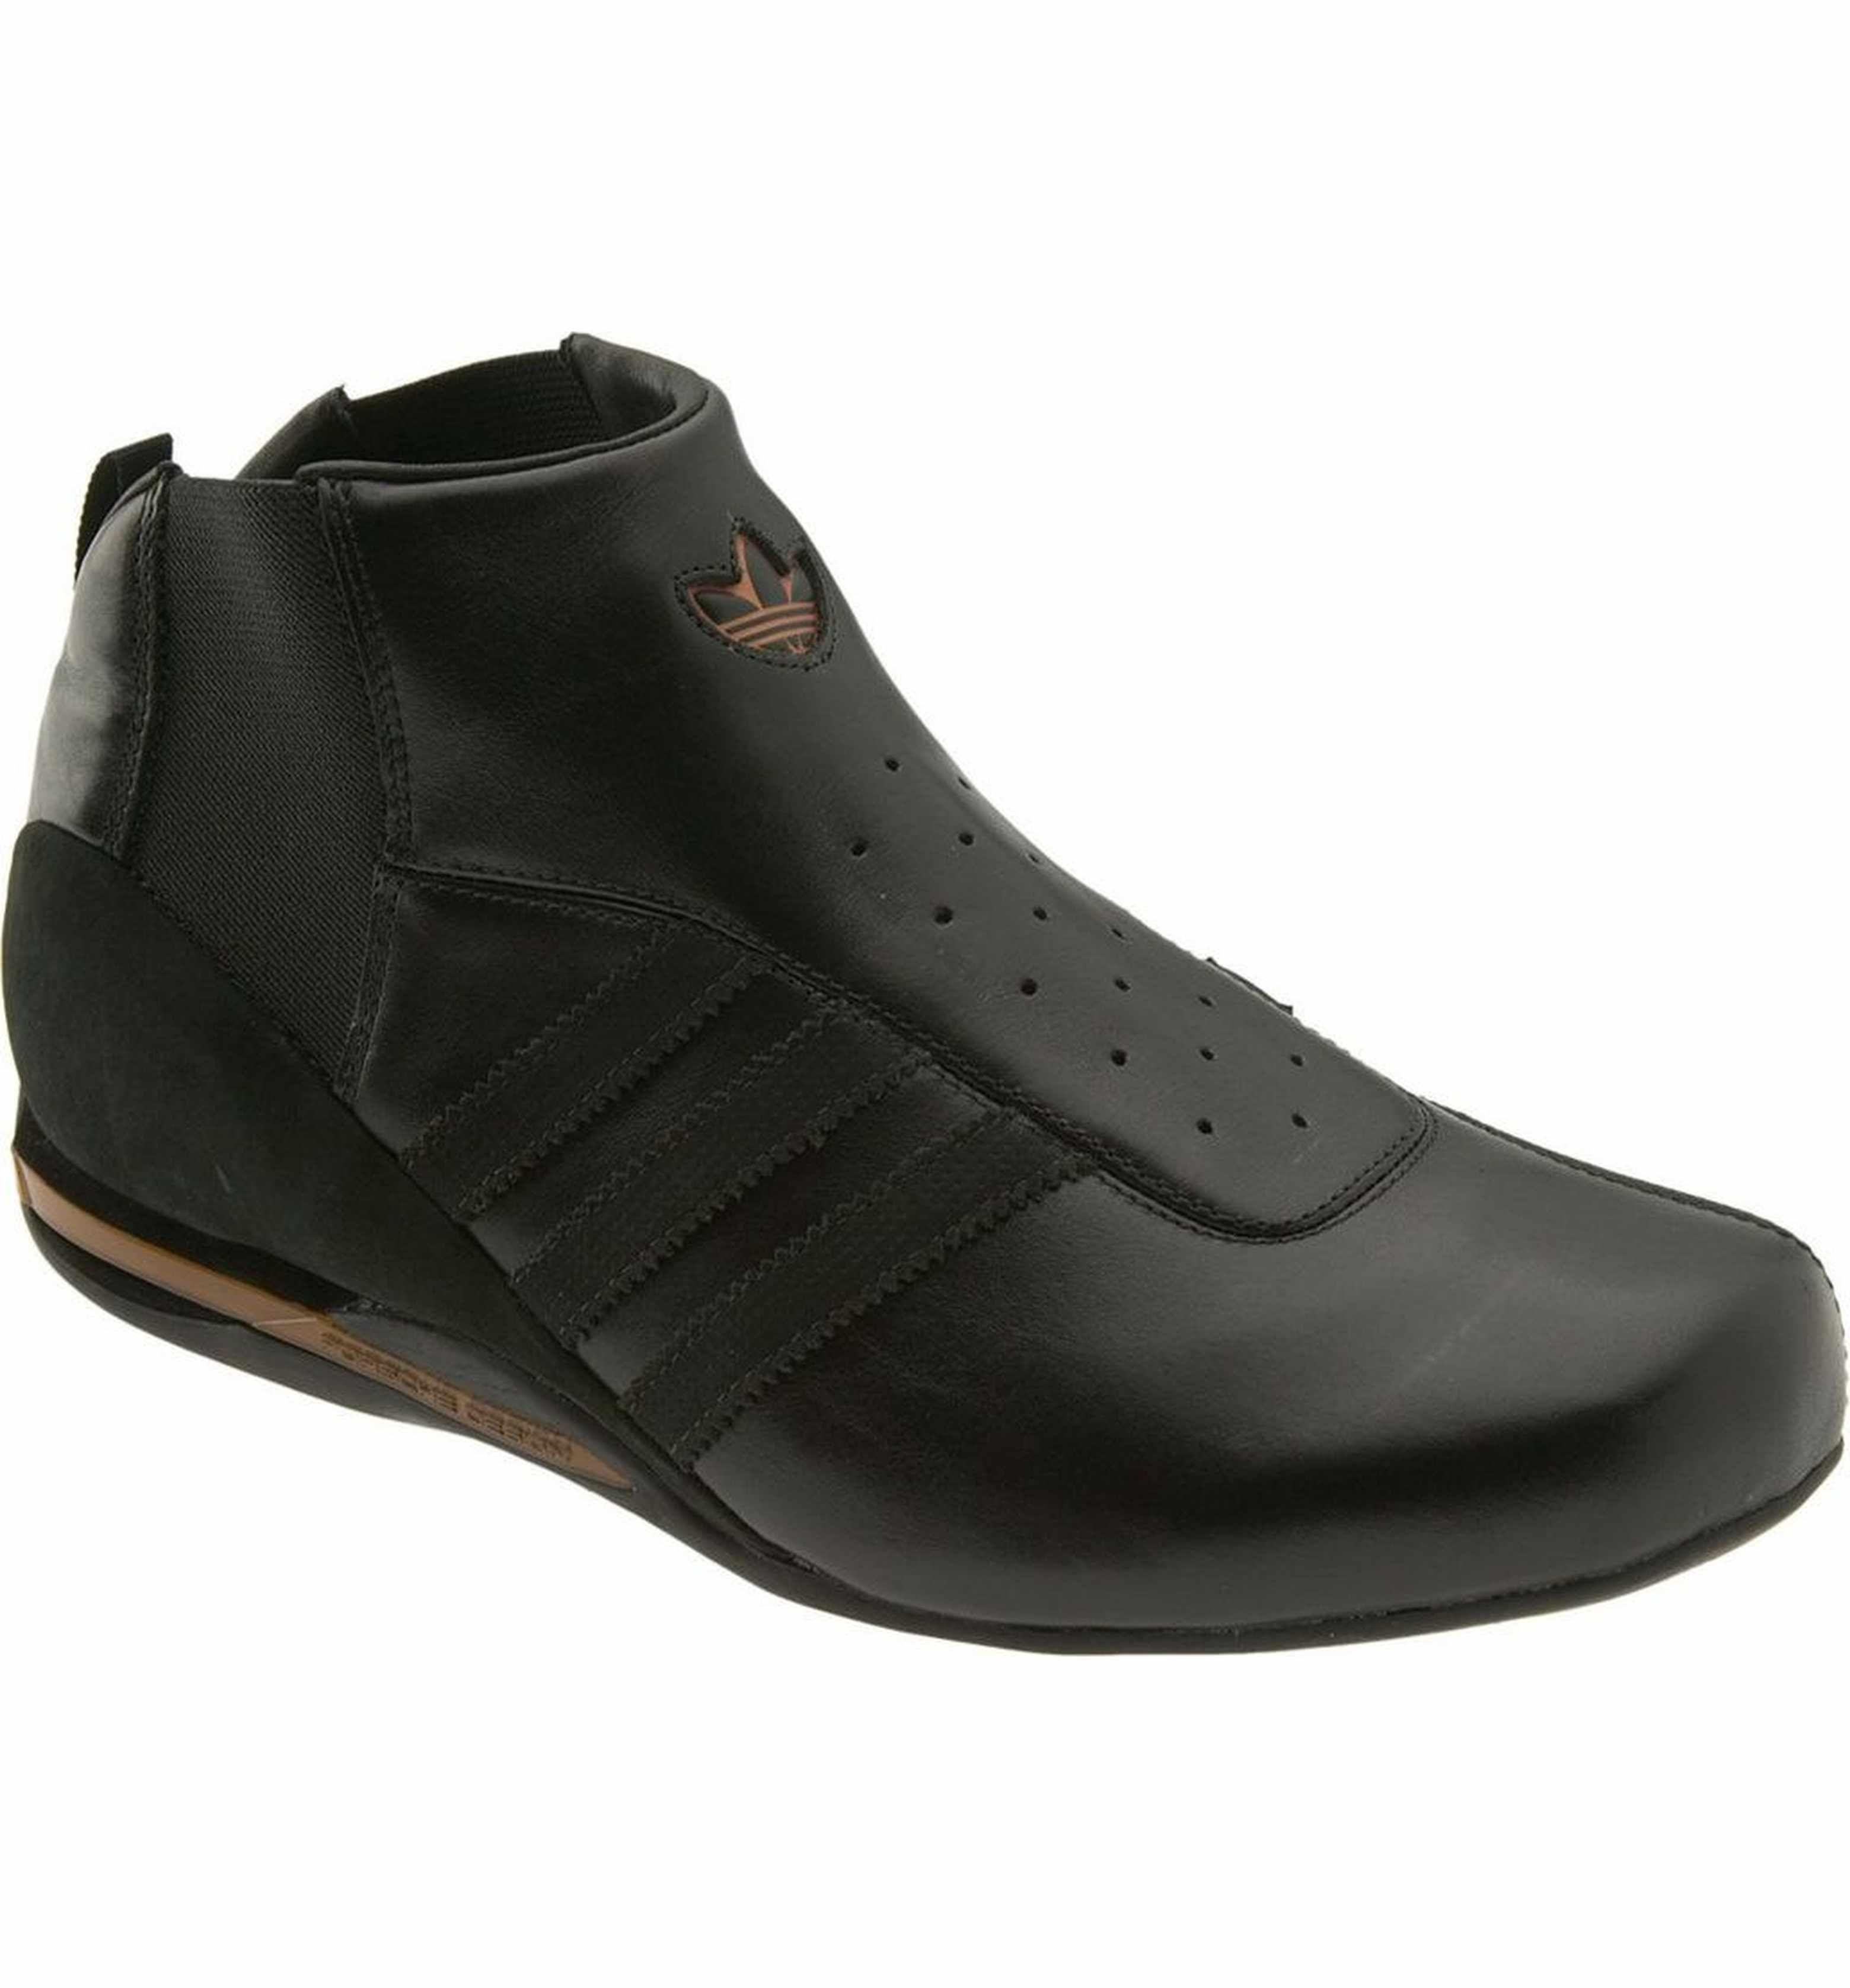 huge selection of cbbe2 acd7d ... new zealand main image adidas porsche design cl mid sneaker ee025 280b0  ...